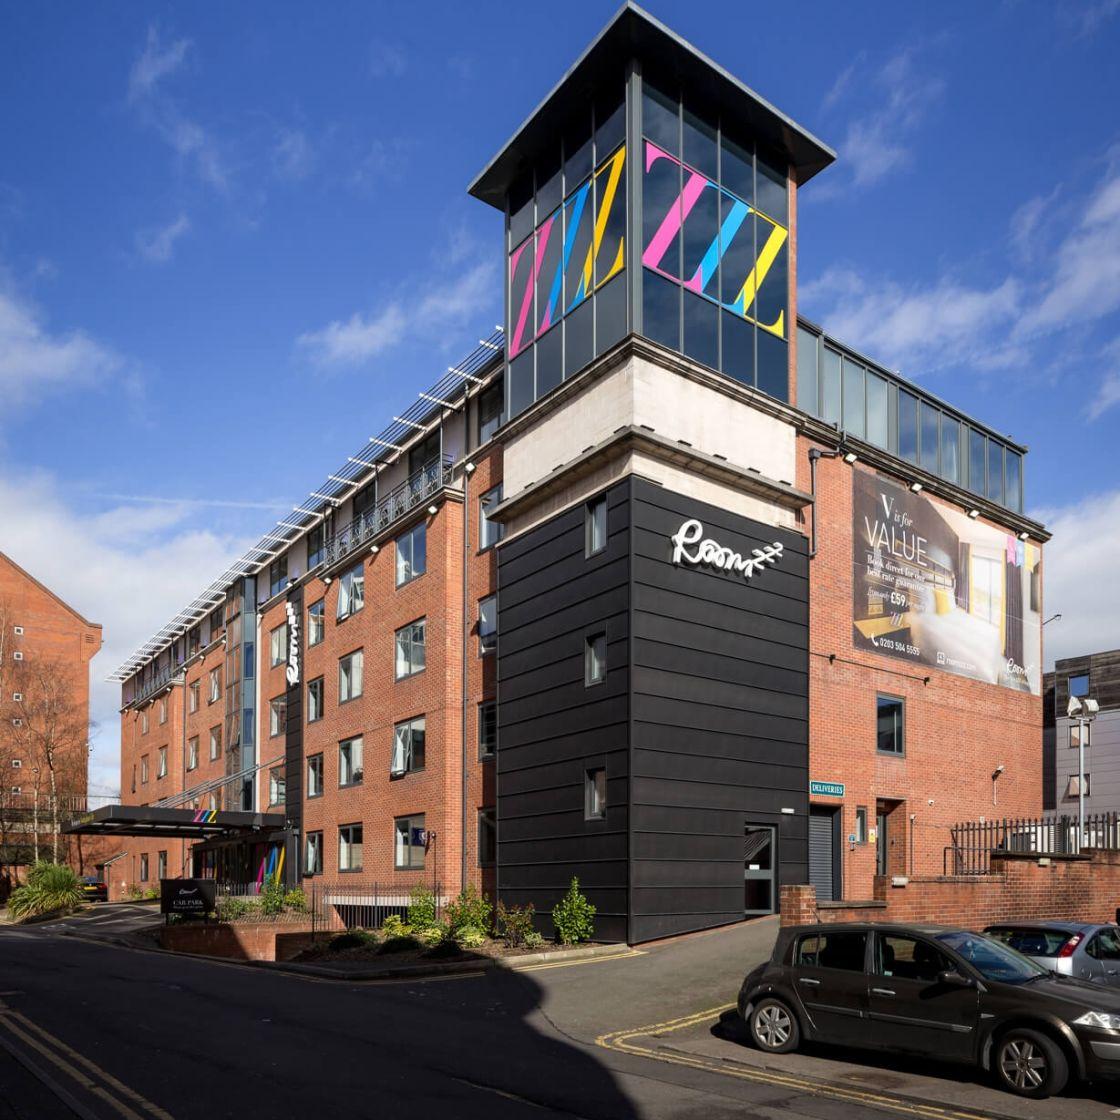 IconInc @ Roomzzz Nottingham City External. Student Accommodation in Nottingham